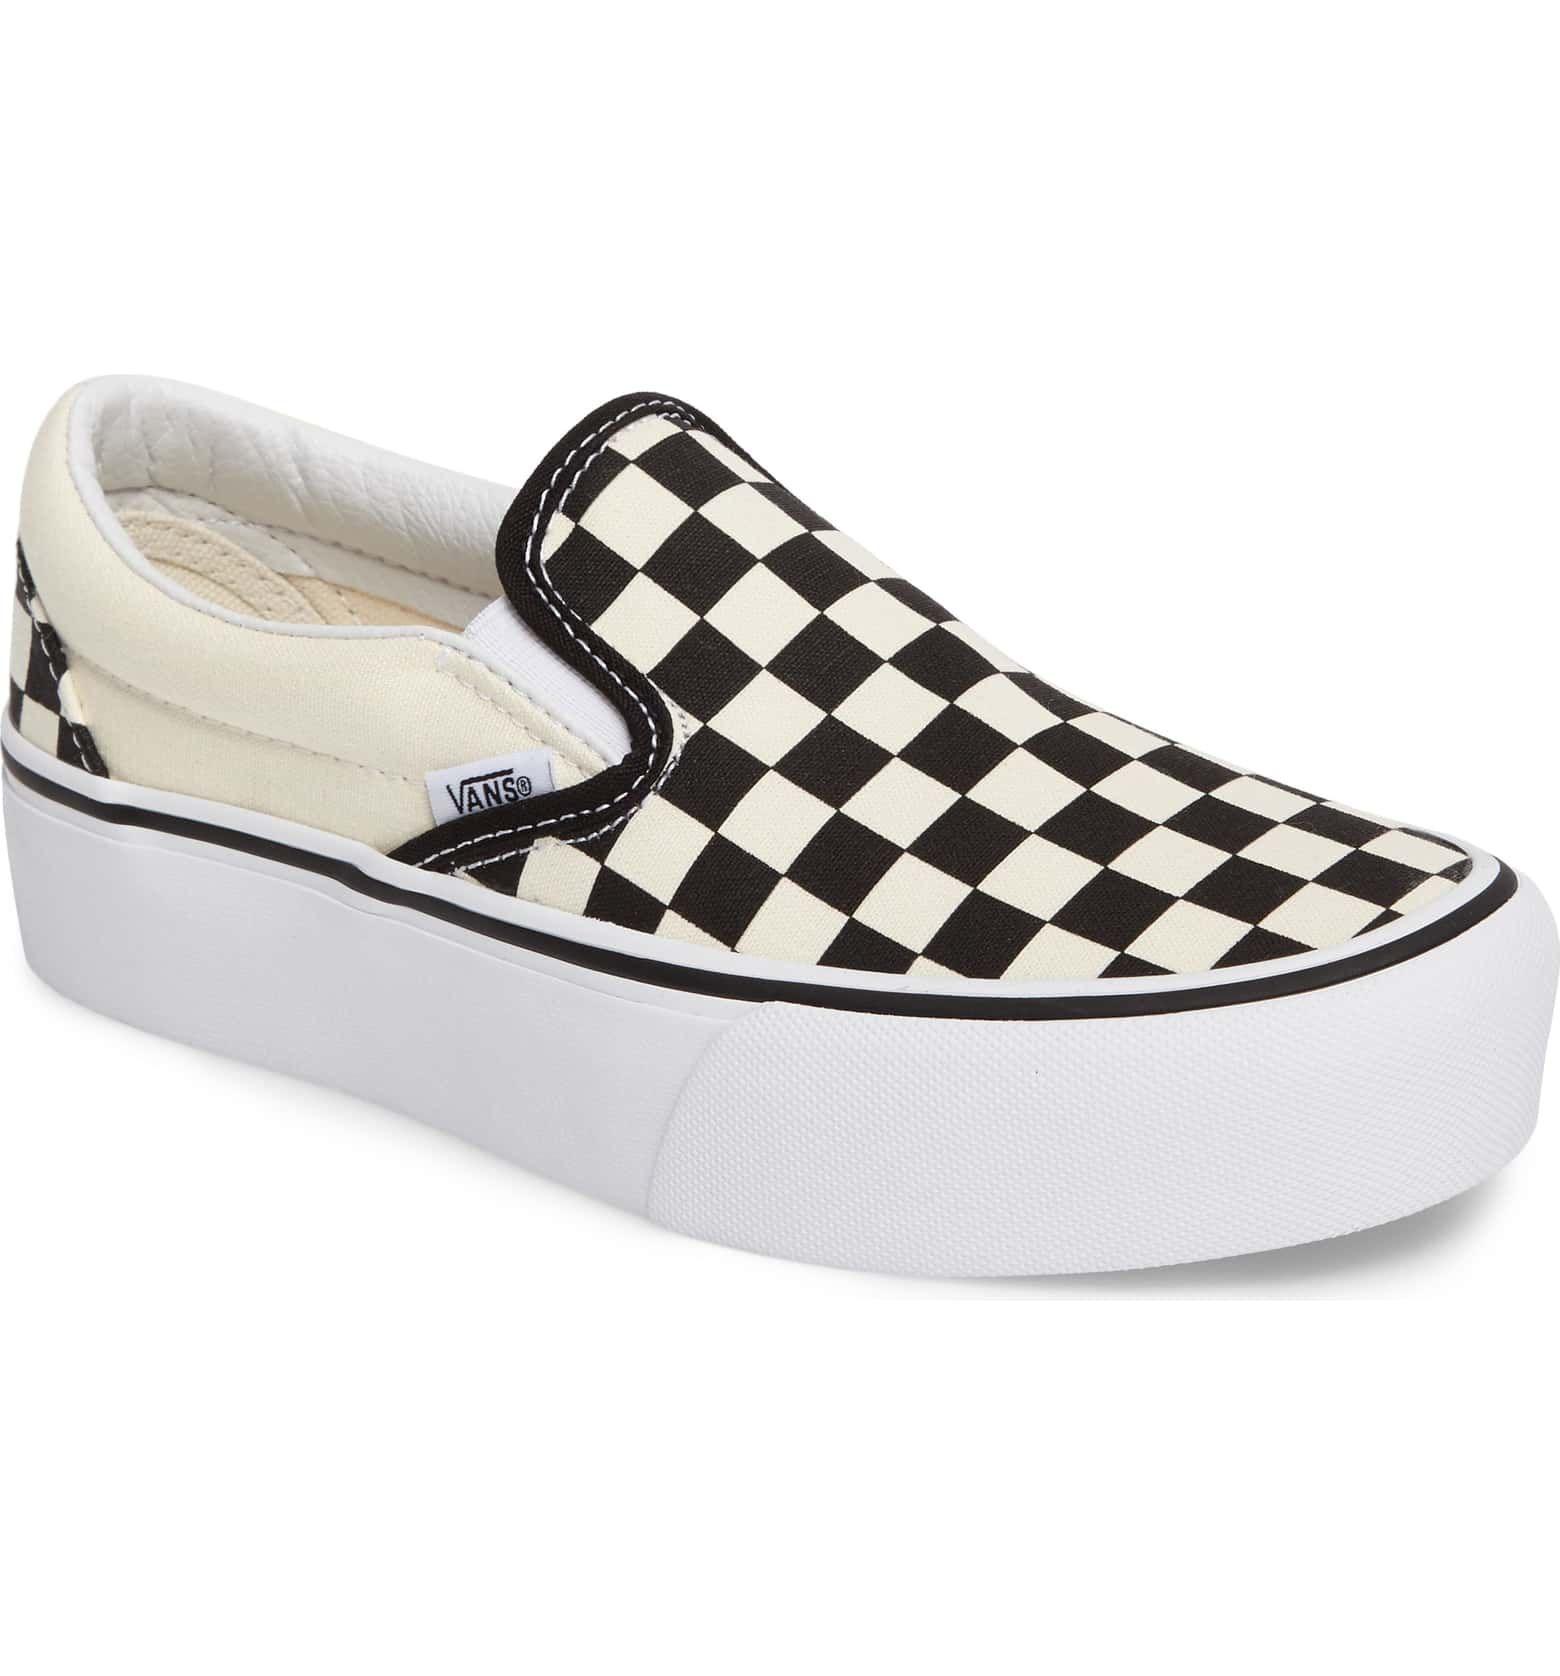 Vans Platform Slip-On Sneaker (Women